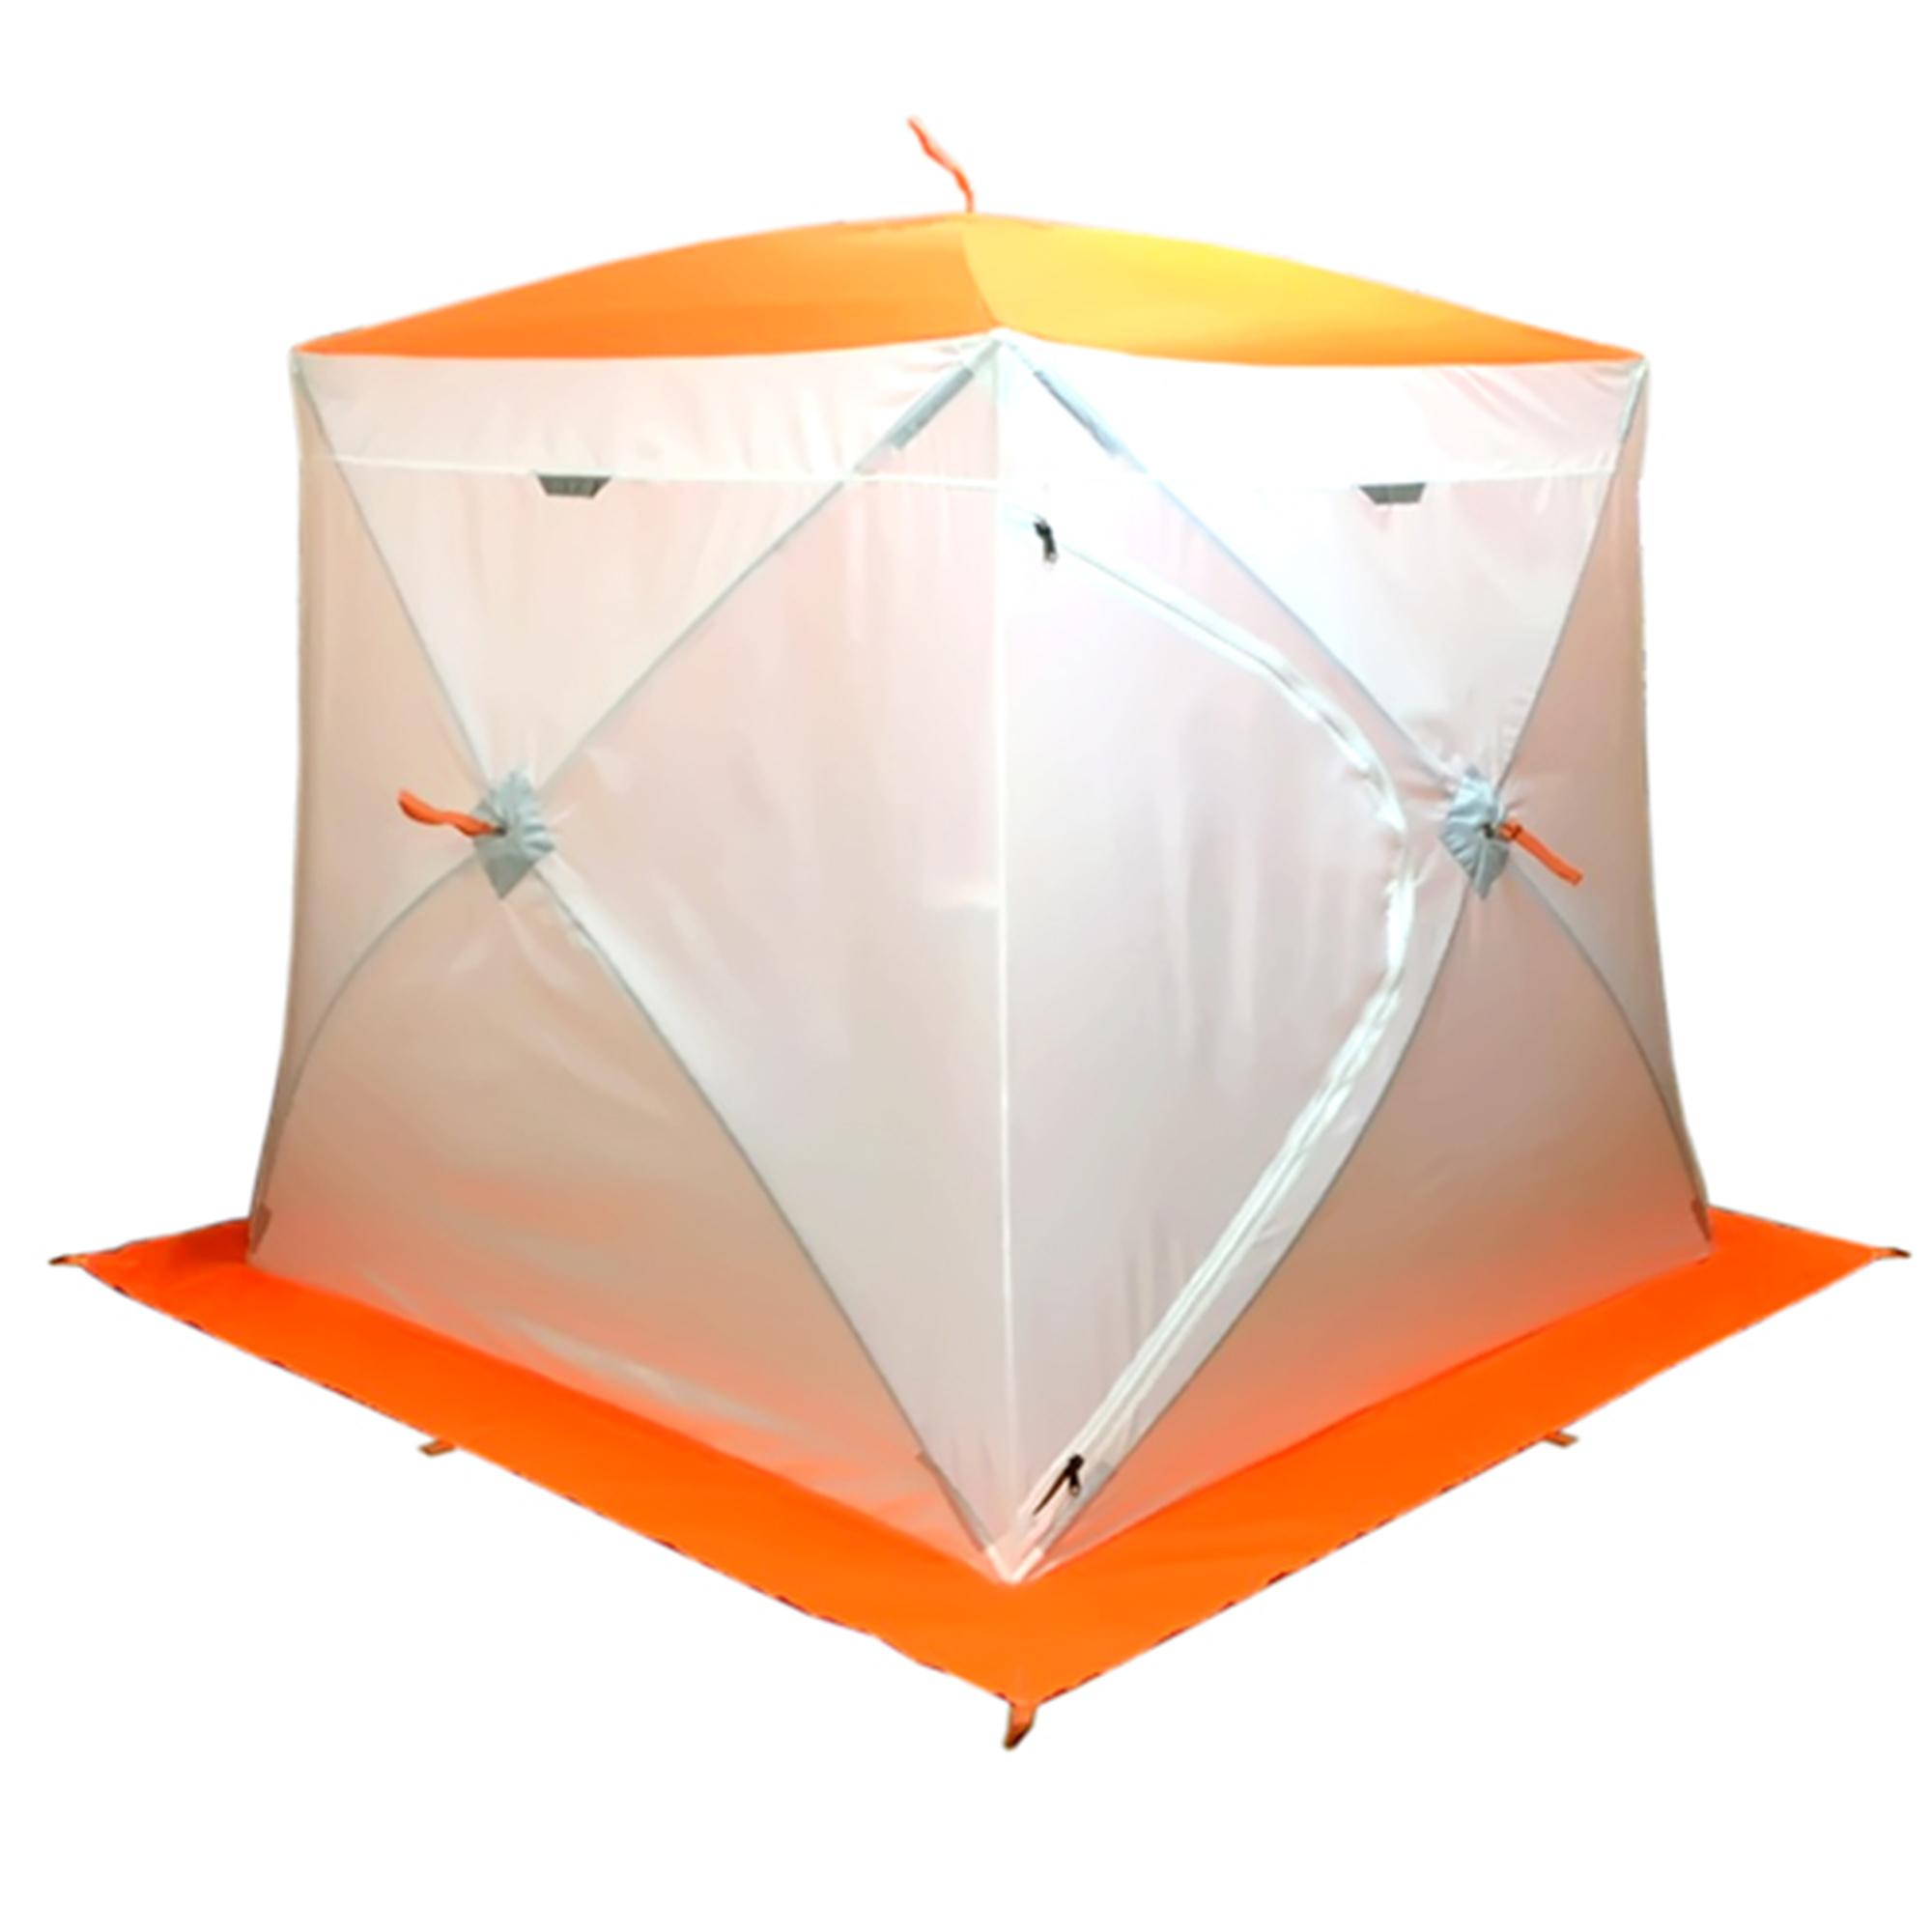 Палатка-куб ПИНГВИН MrFisher 170 ST, Палатки - арт. 1128430162